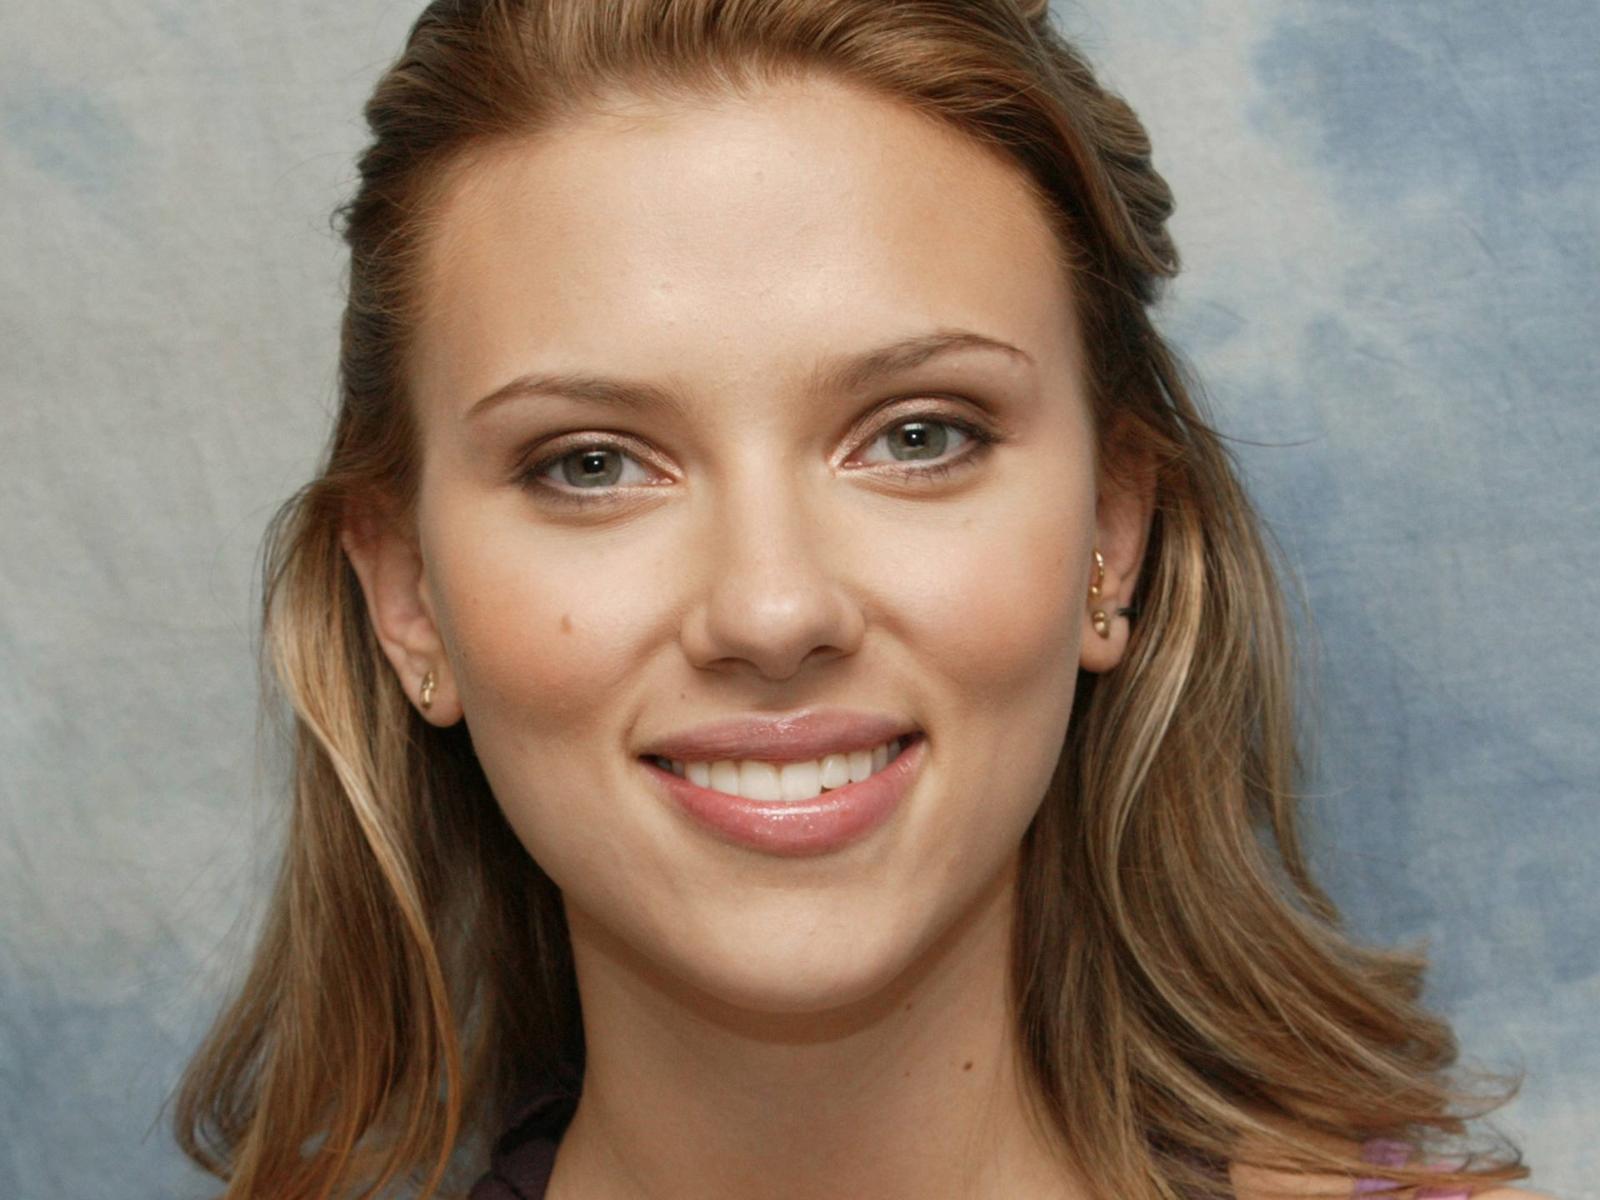 Katrina Kaif Cute Face Hd Wallpapers Scarlett Johansson Beautiful Eyes Wallpaper Taste Wallpapers